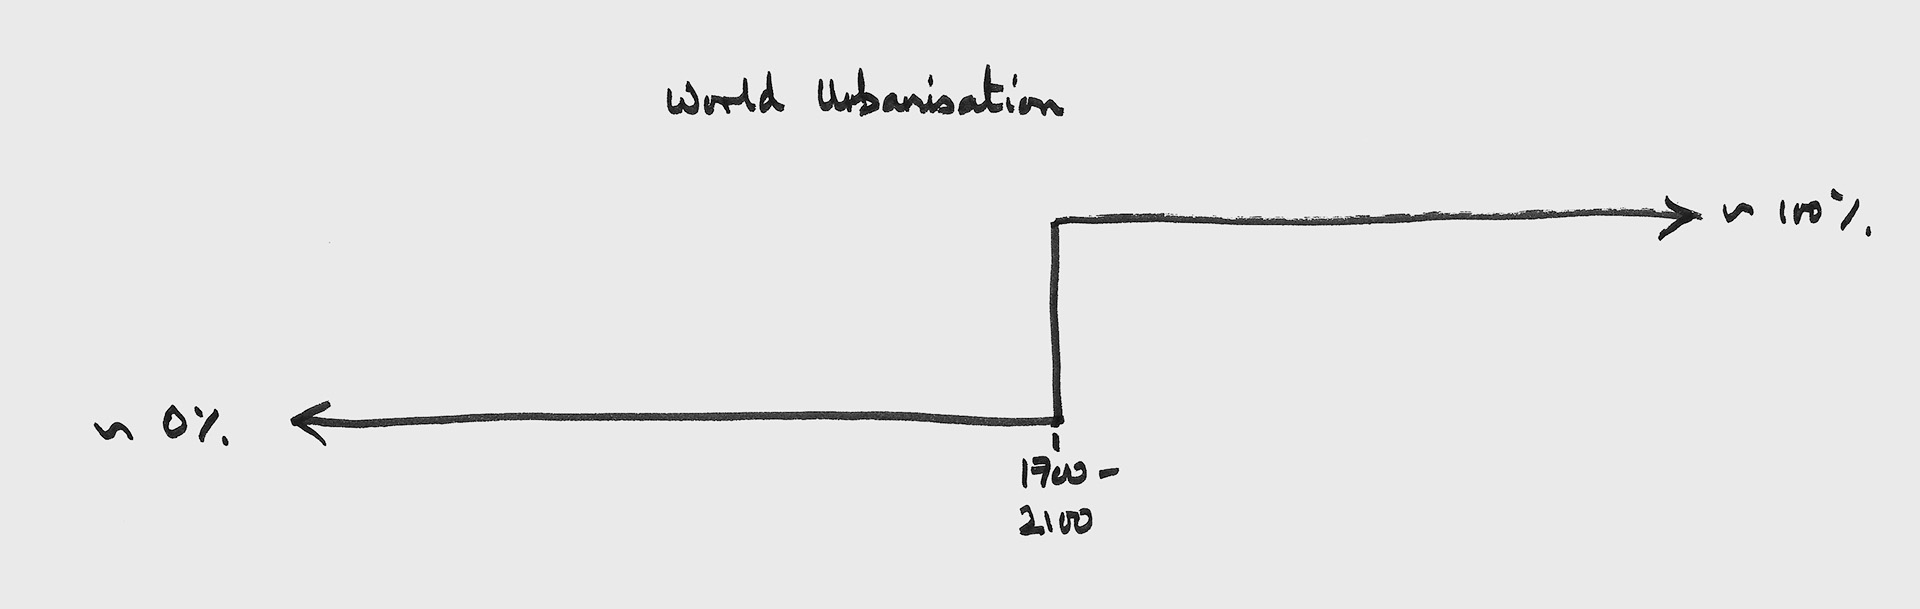 world urbanisation